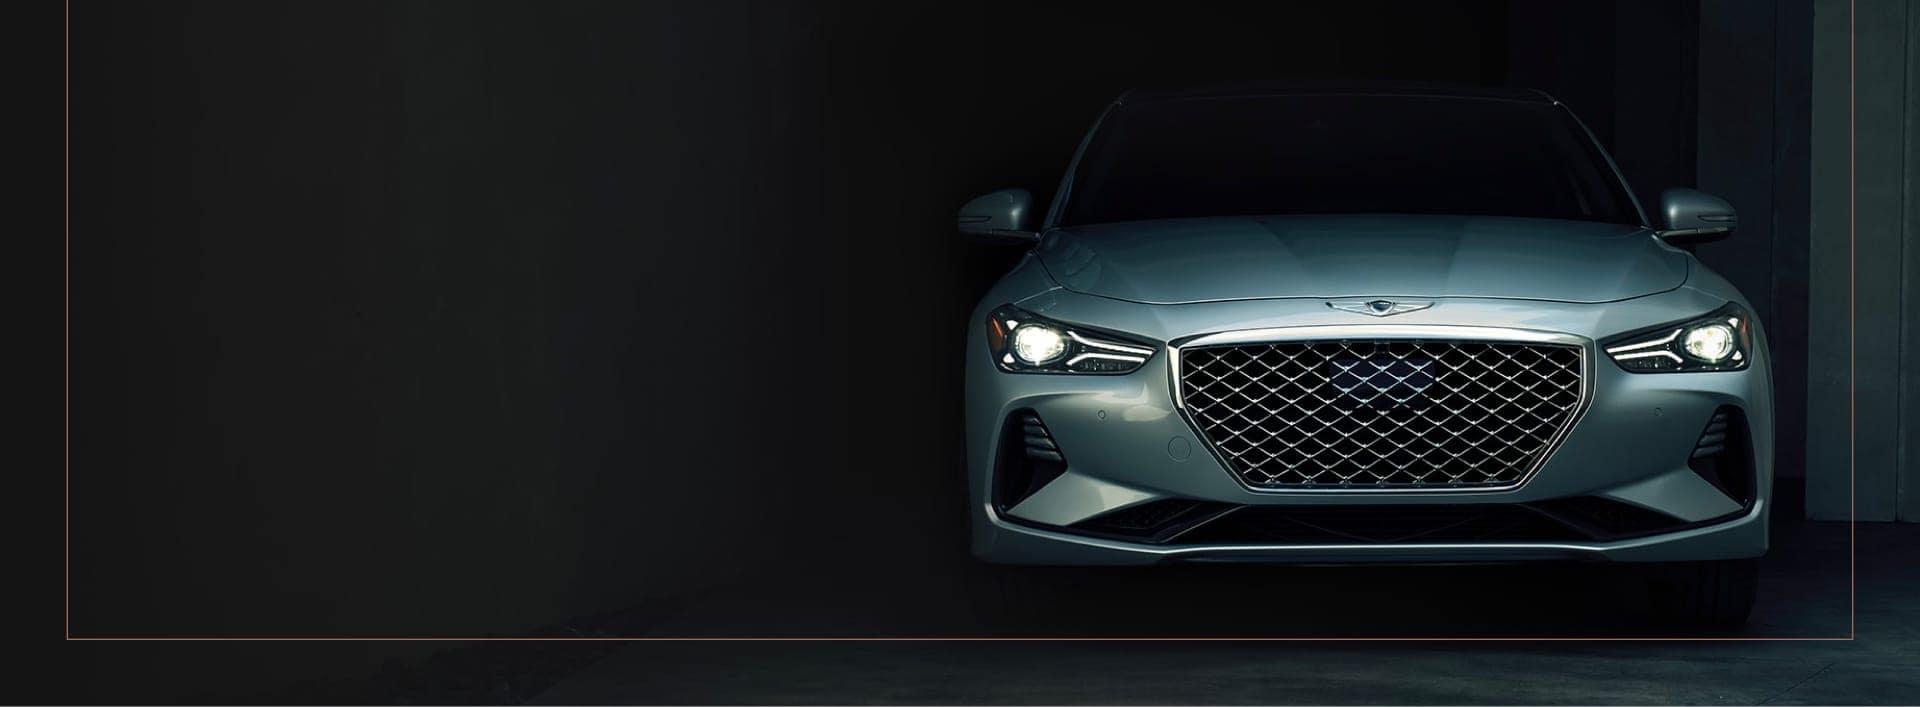 Gray Genesis Car